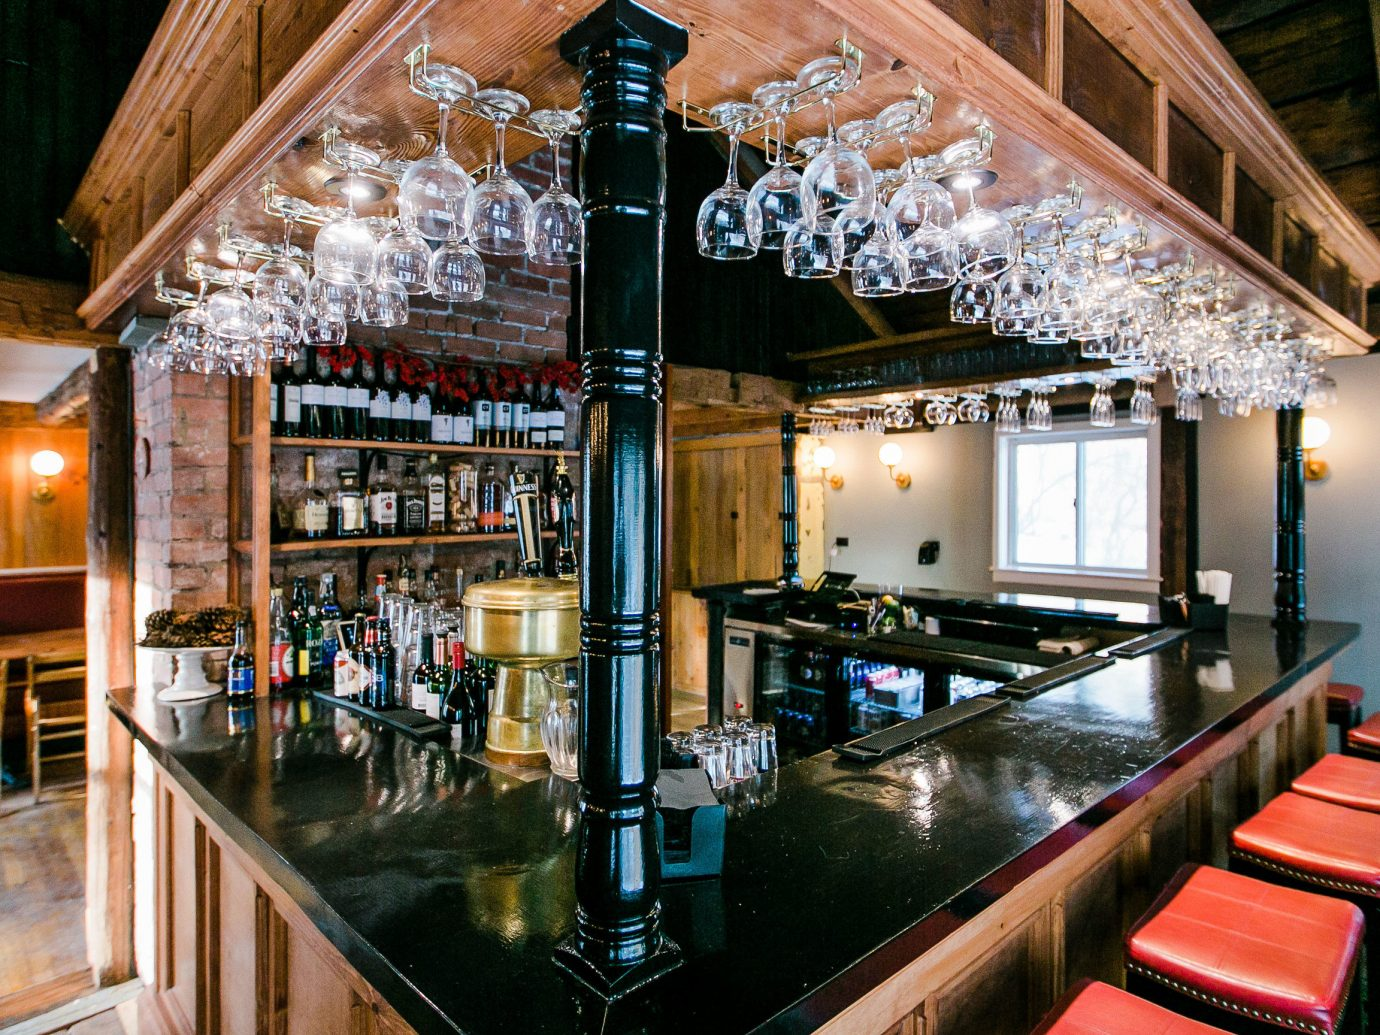 Mountains + Skiing Trip Ideas indoor floor Bar interior design restaurant